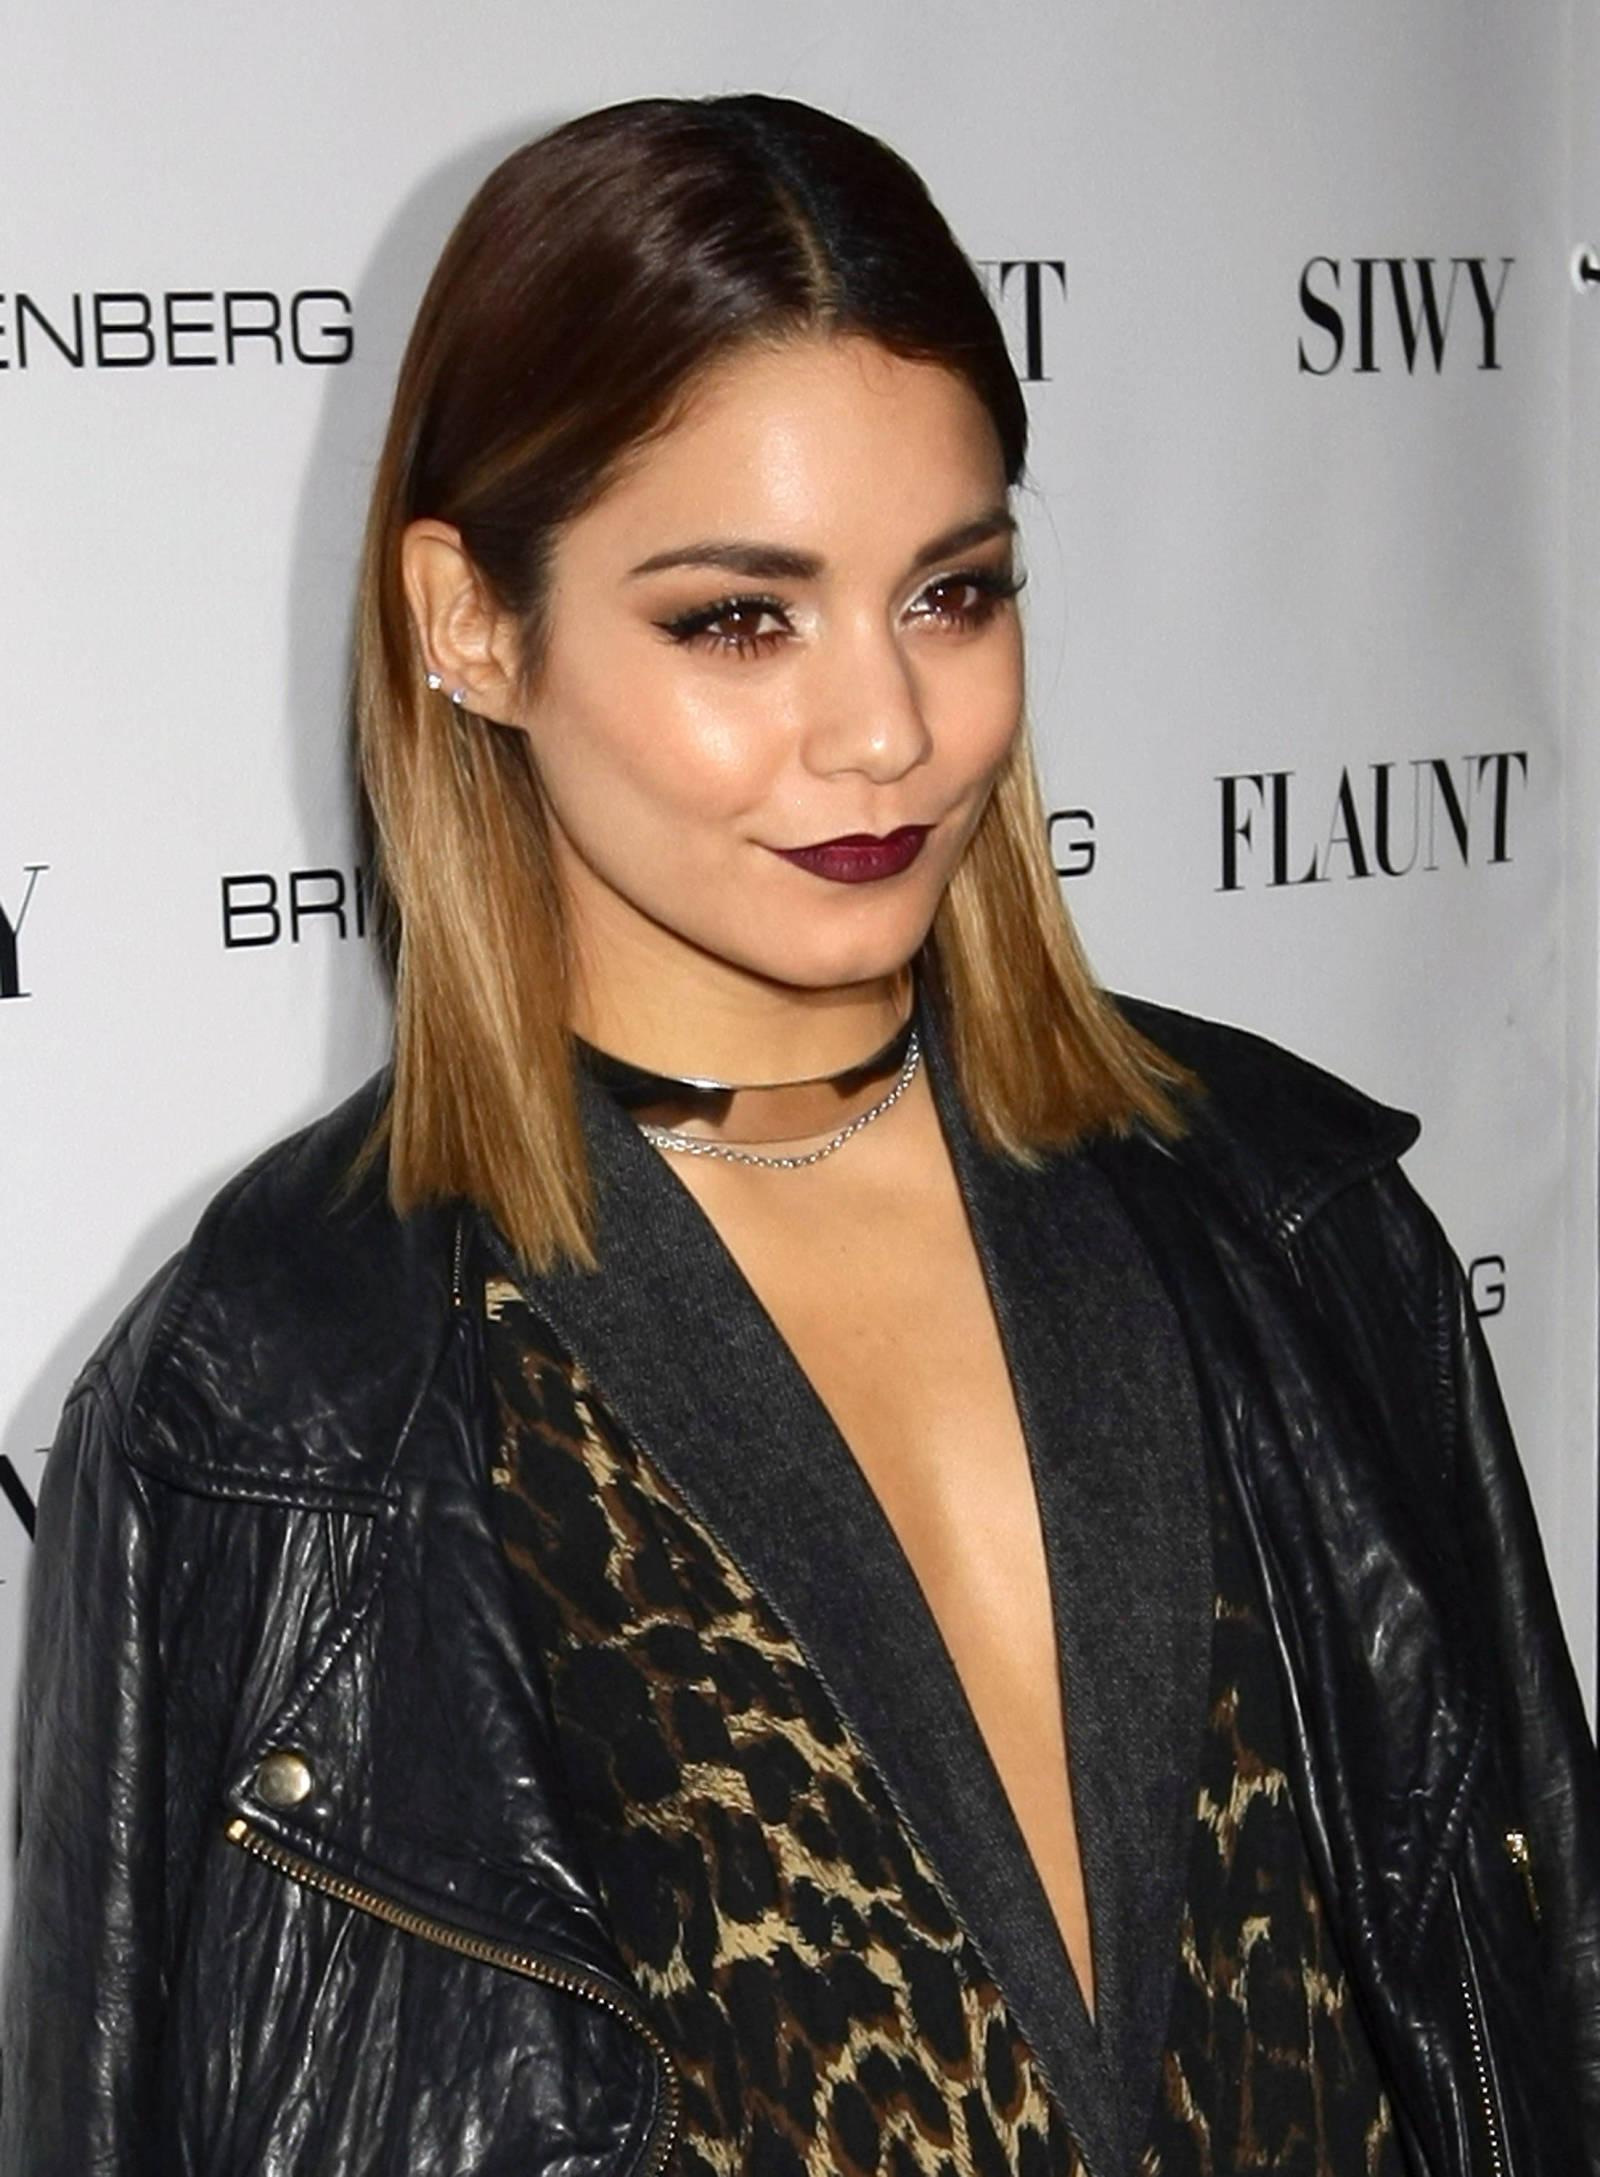 Vanessa Hudgens S Grunge Makeup Flaunt Magazine Party